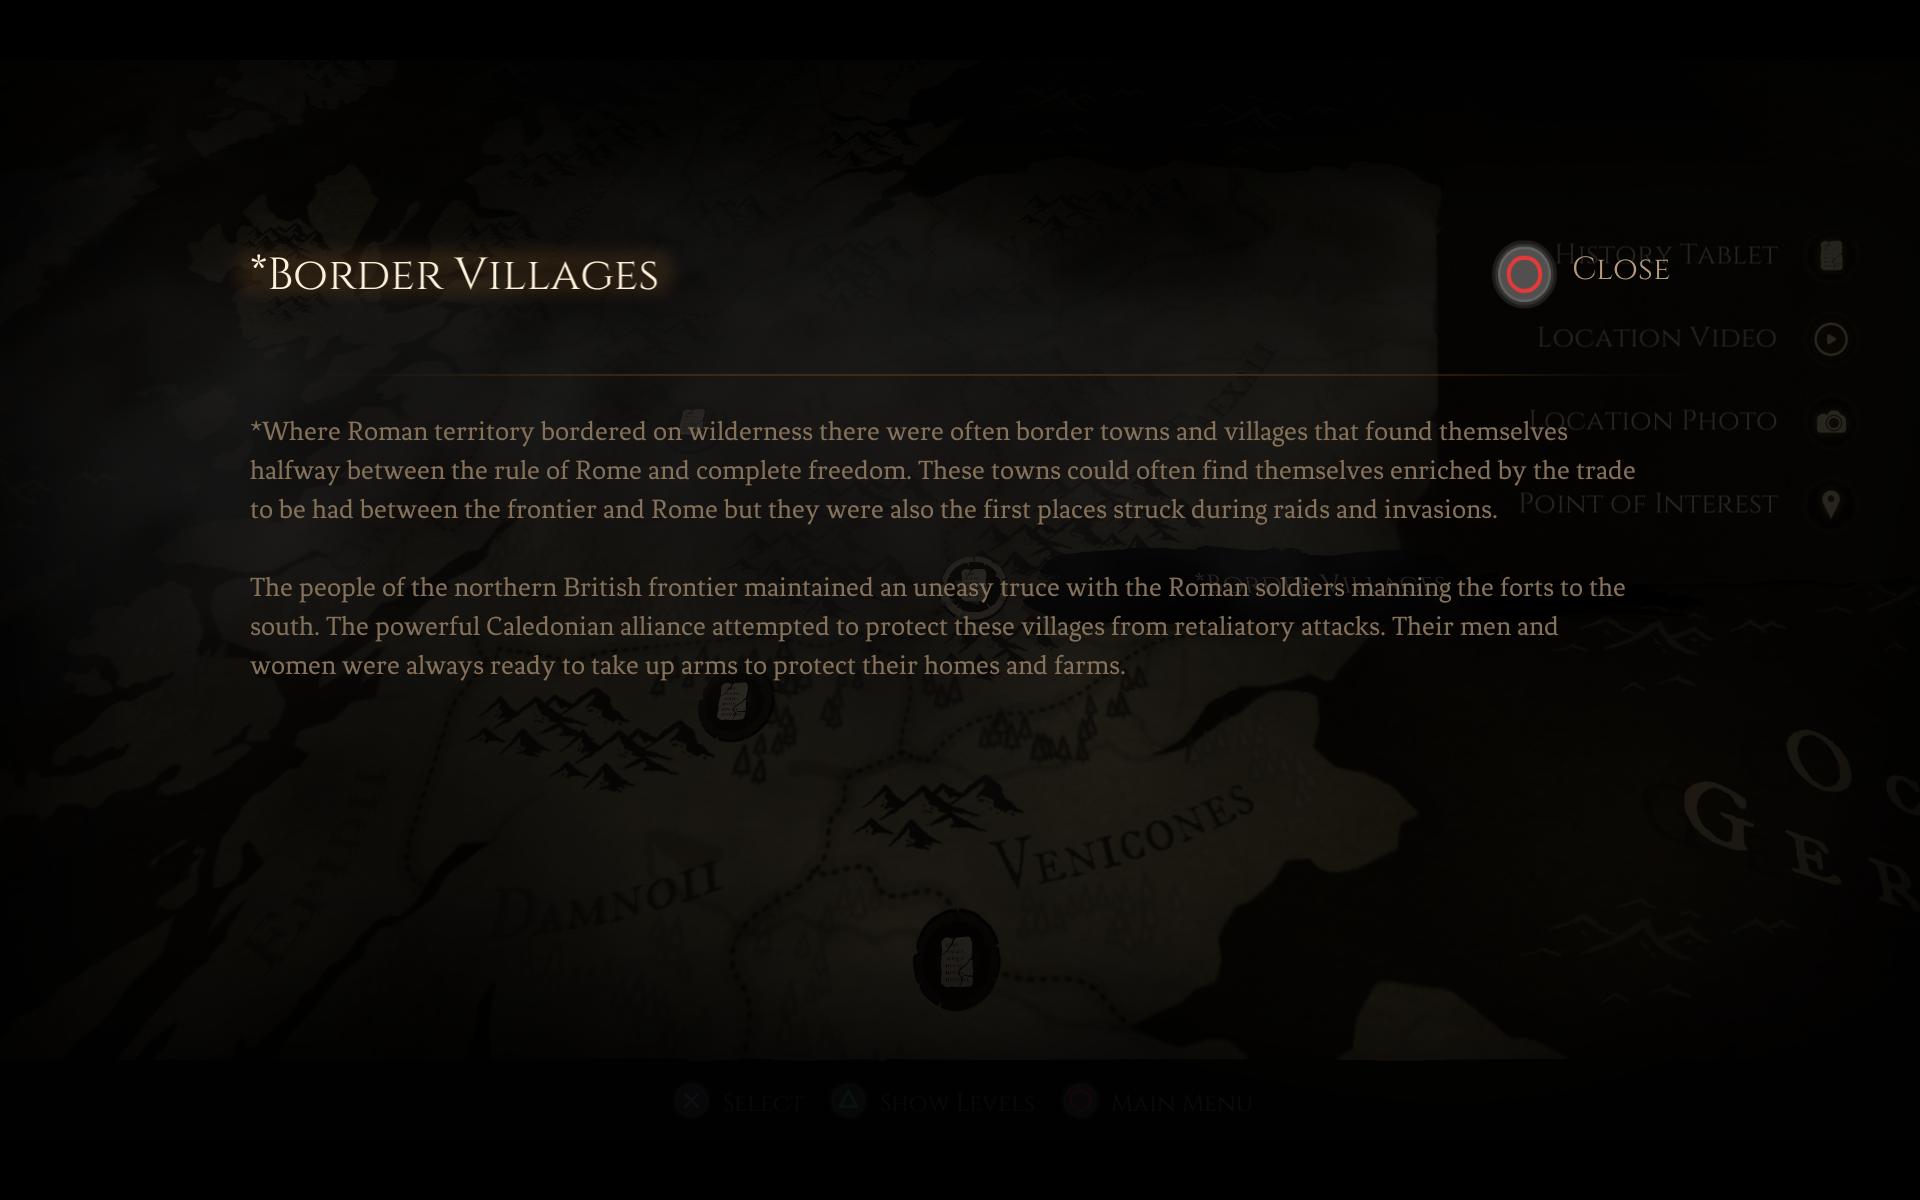 Border Villages